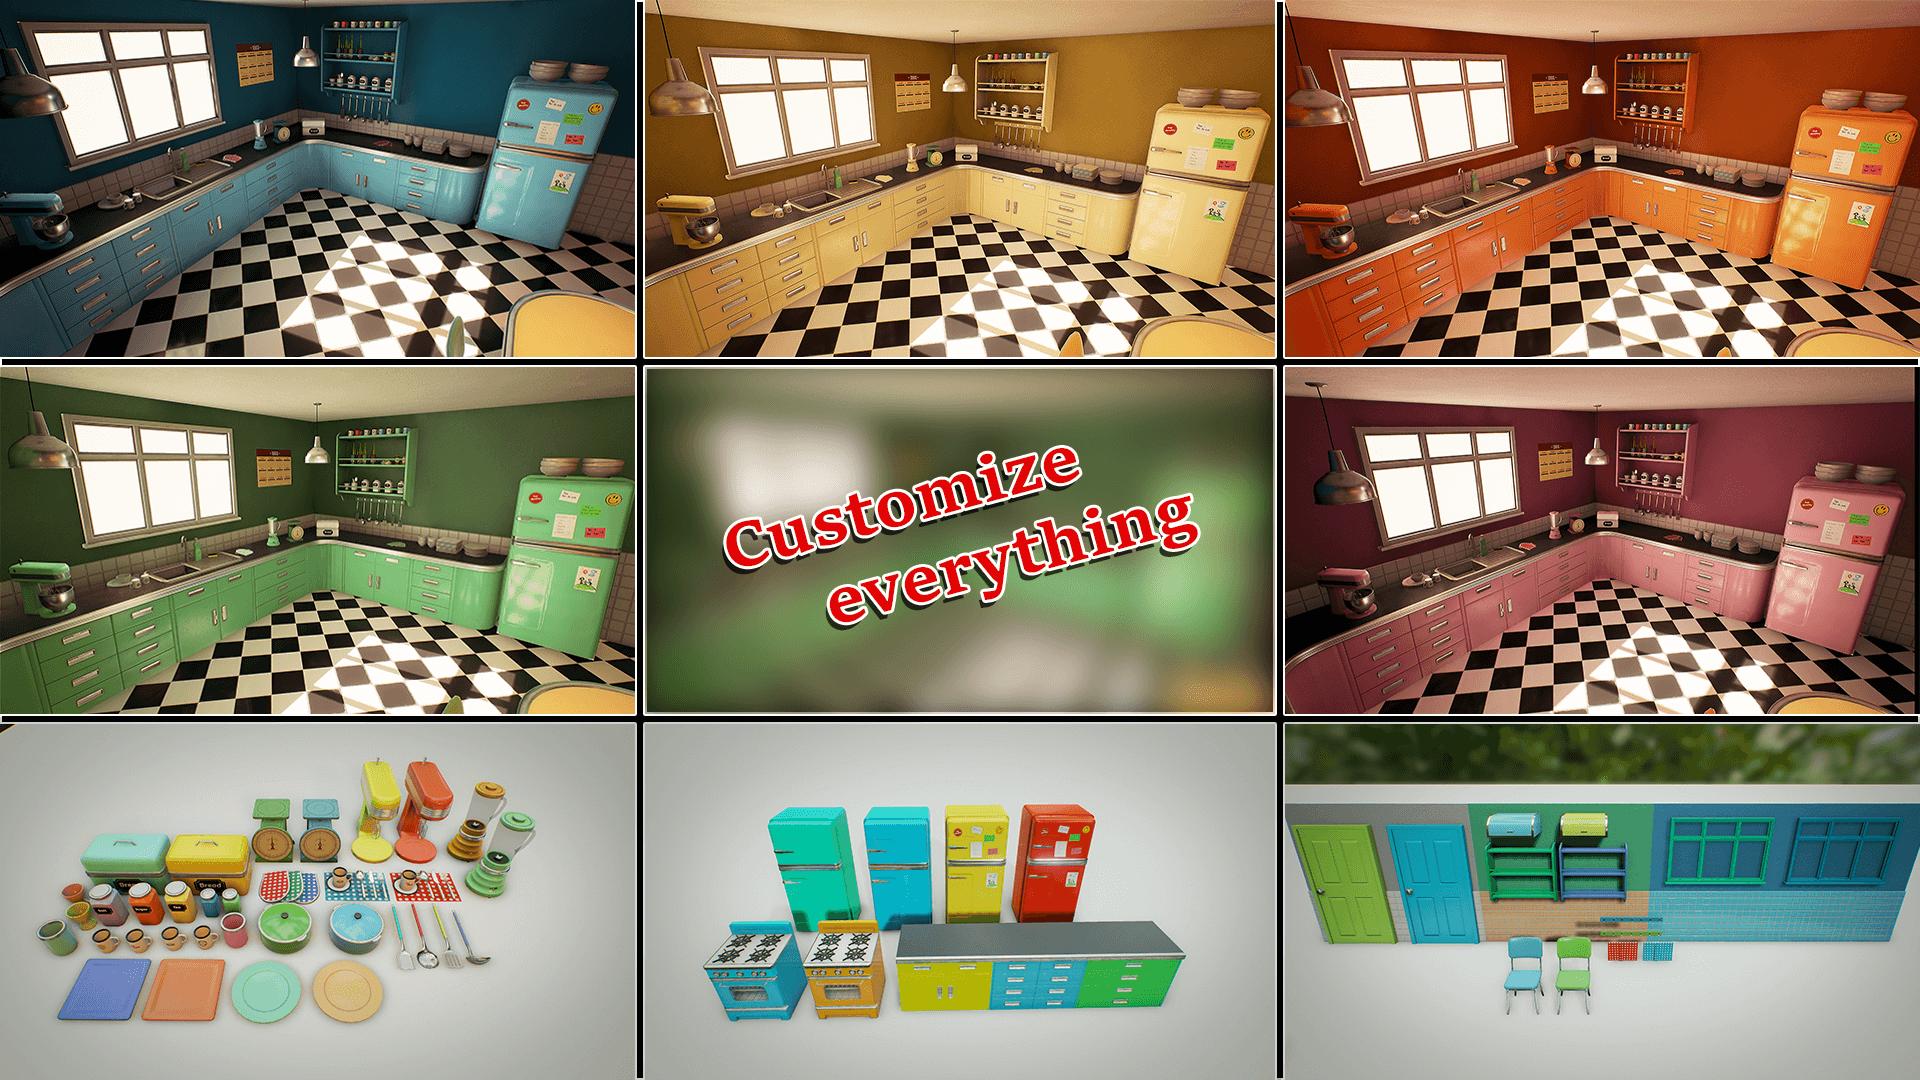 Retro Kitchen Customizable Retro Kitchen By Nguyen Cong Thai In Environments